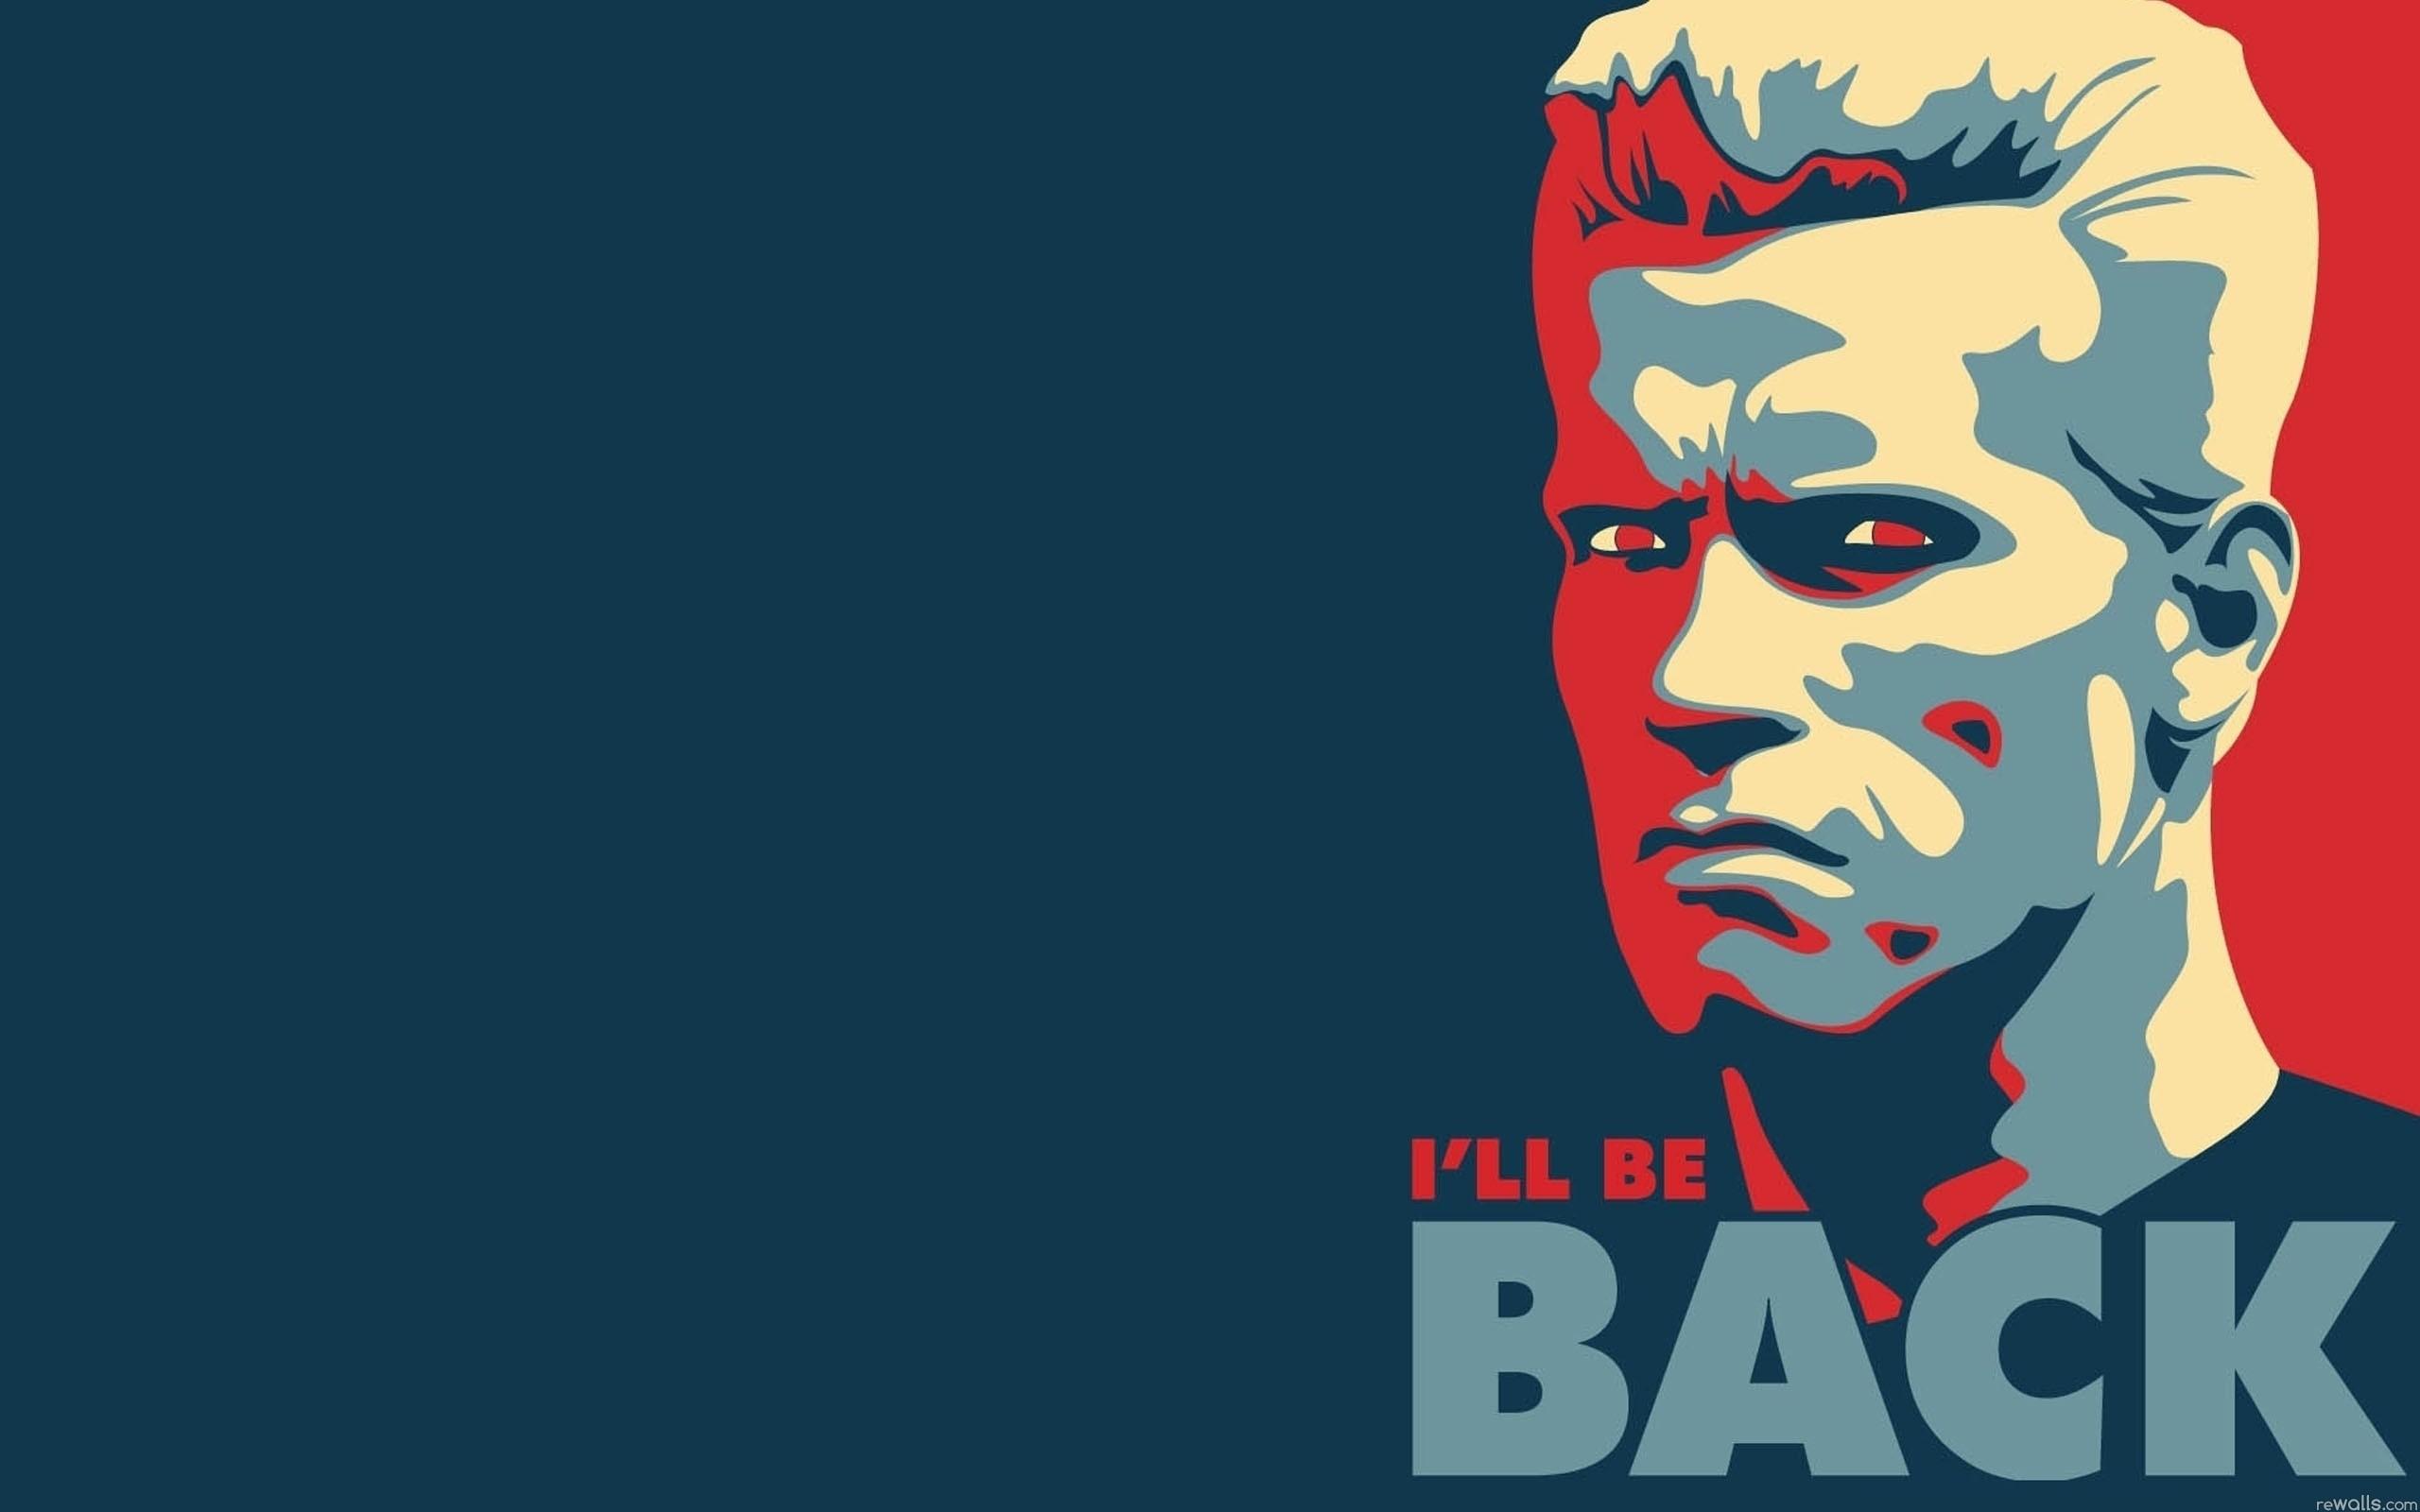 Res: 2560x1600, Terminator movies text arnold schwarzenegger actors terminator 2 wallpaper